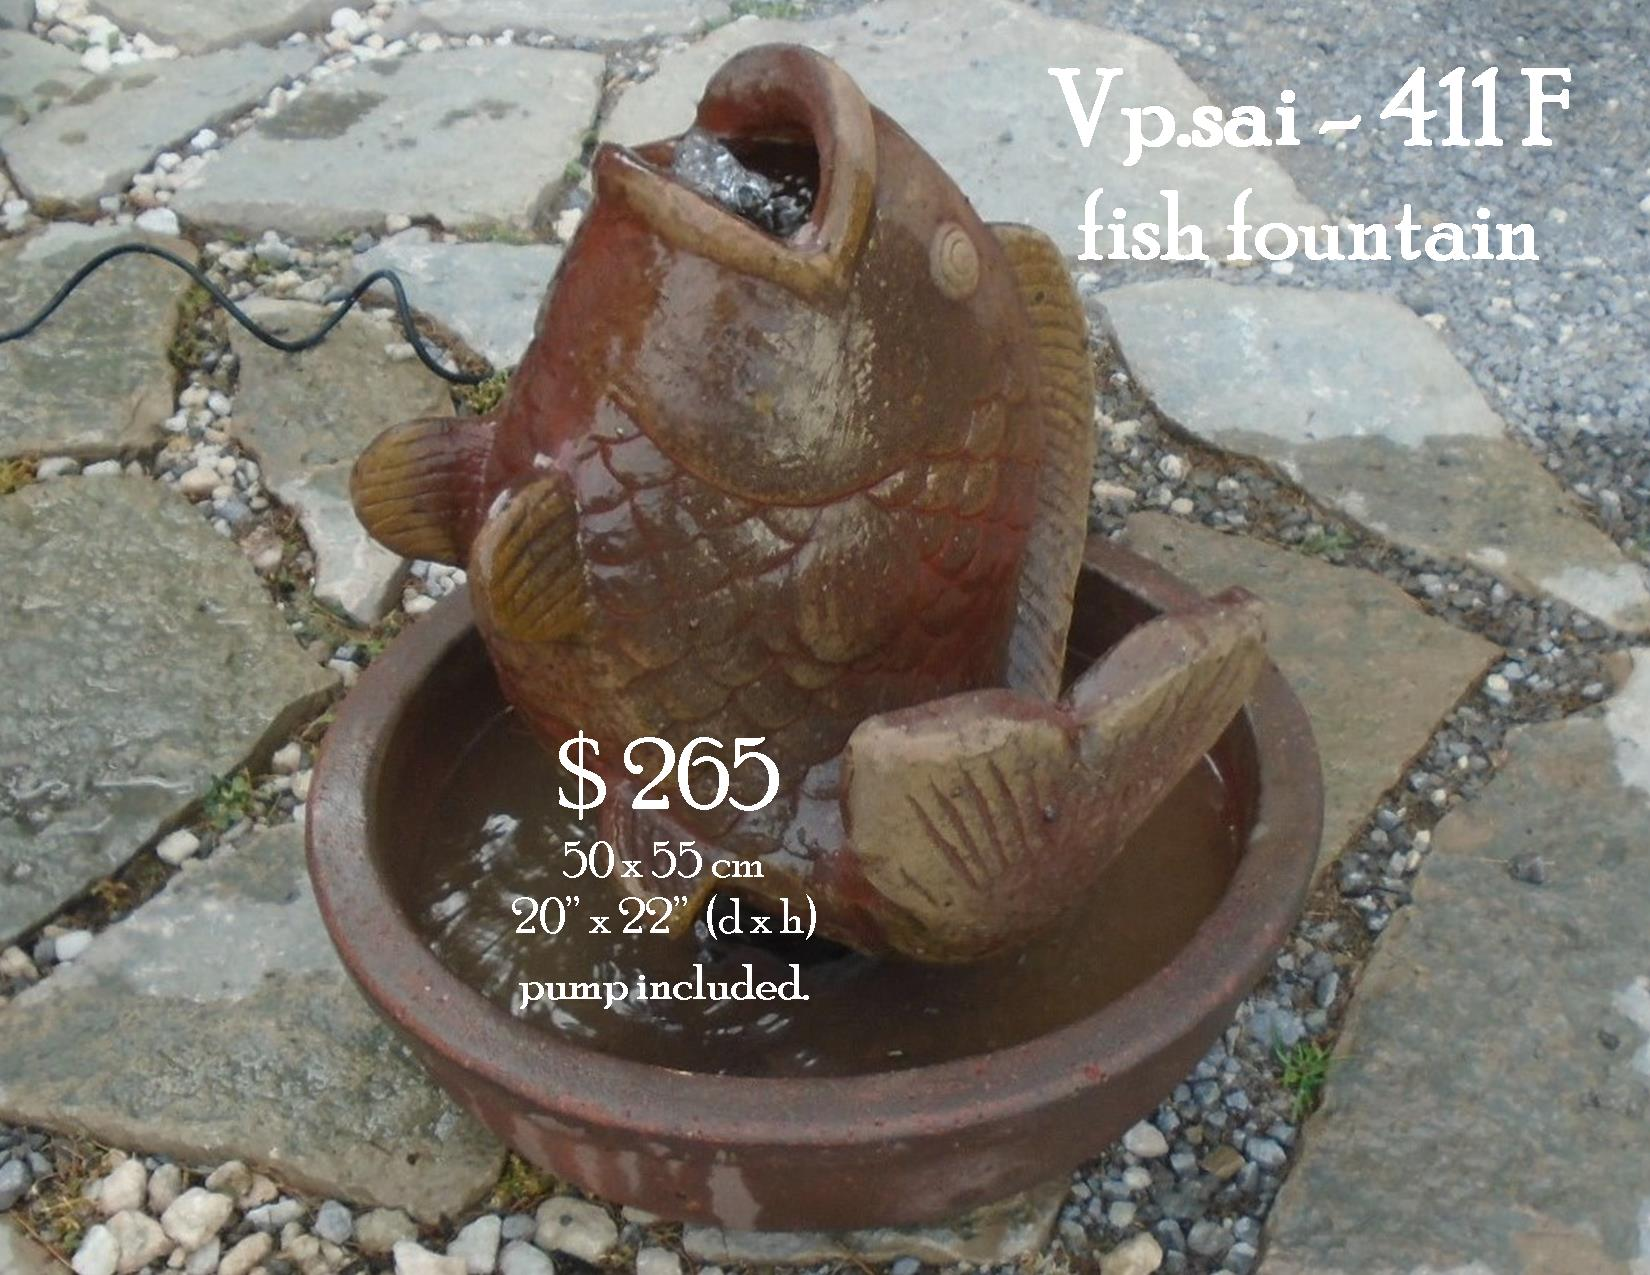 Vp.sai - 411 F fish fountain